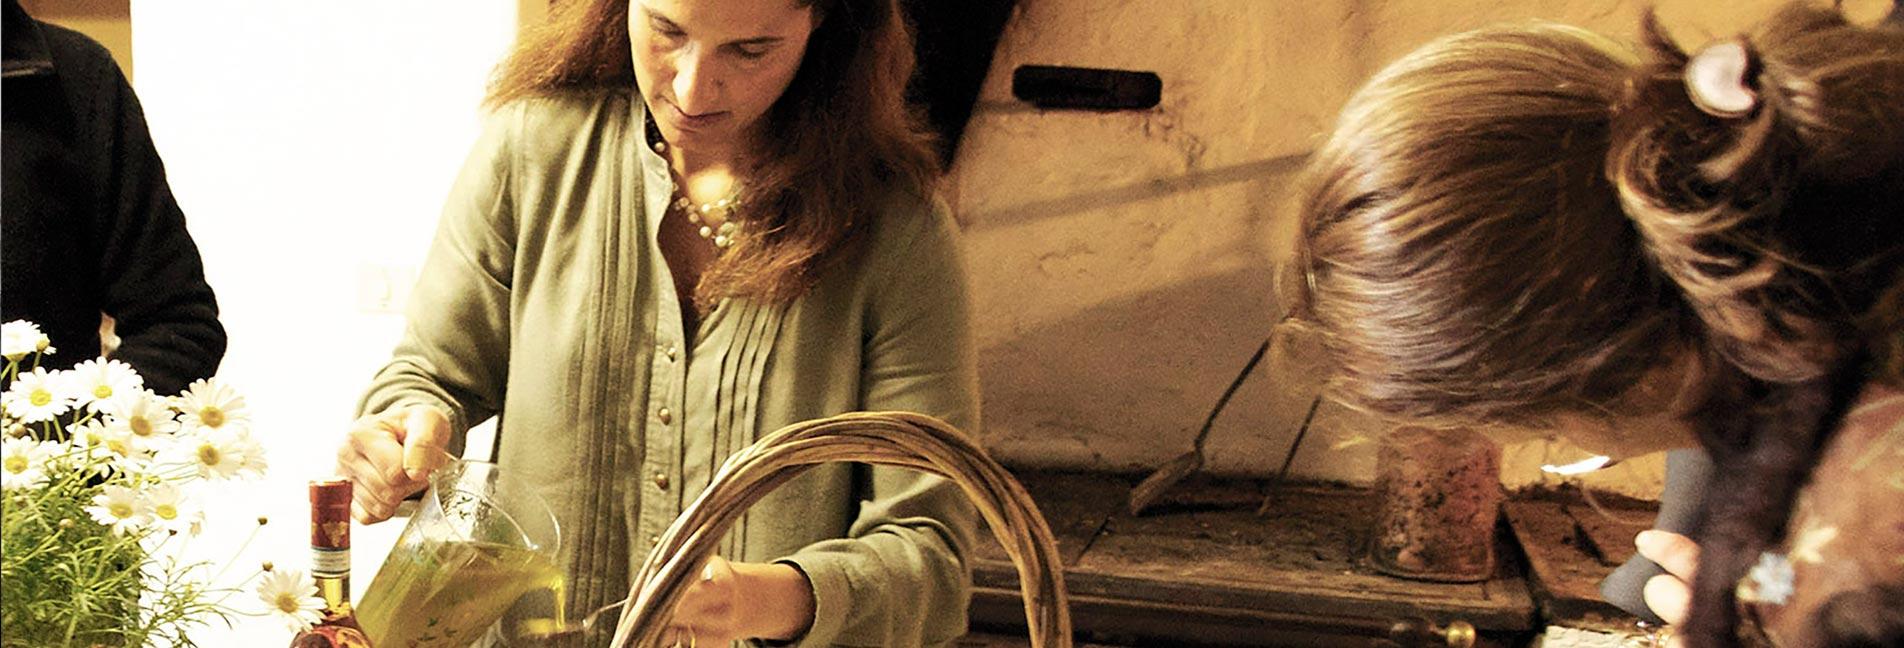 embrace the enchanting Tuscan lifestyle